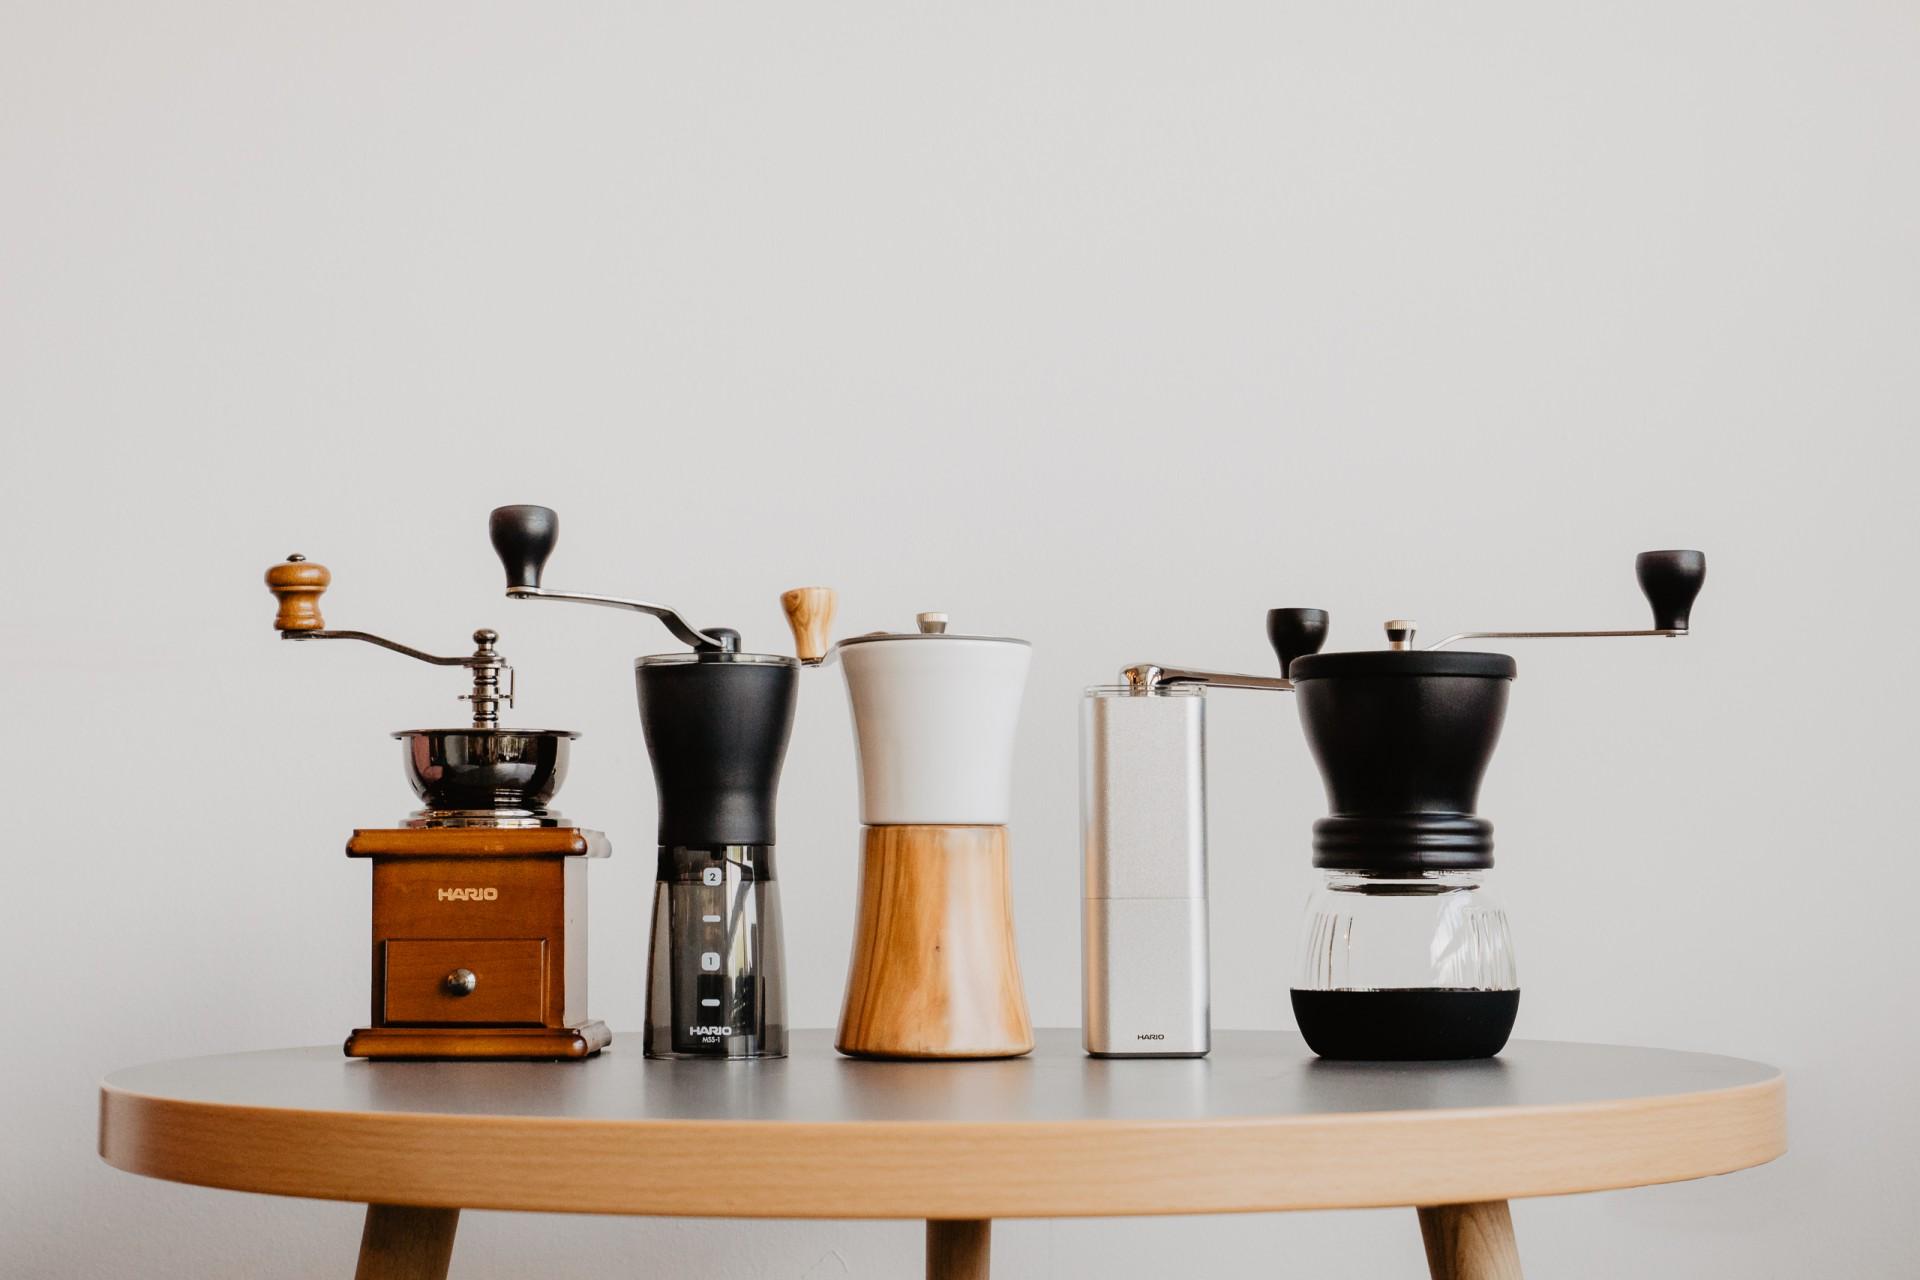 młynek do kawy hario